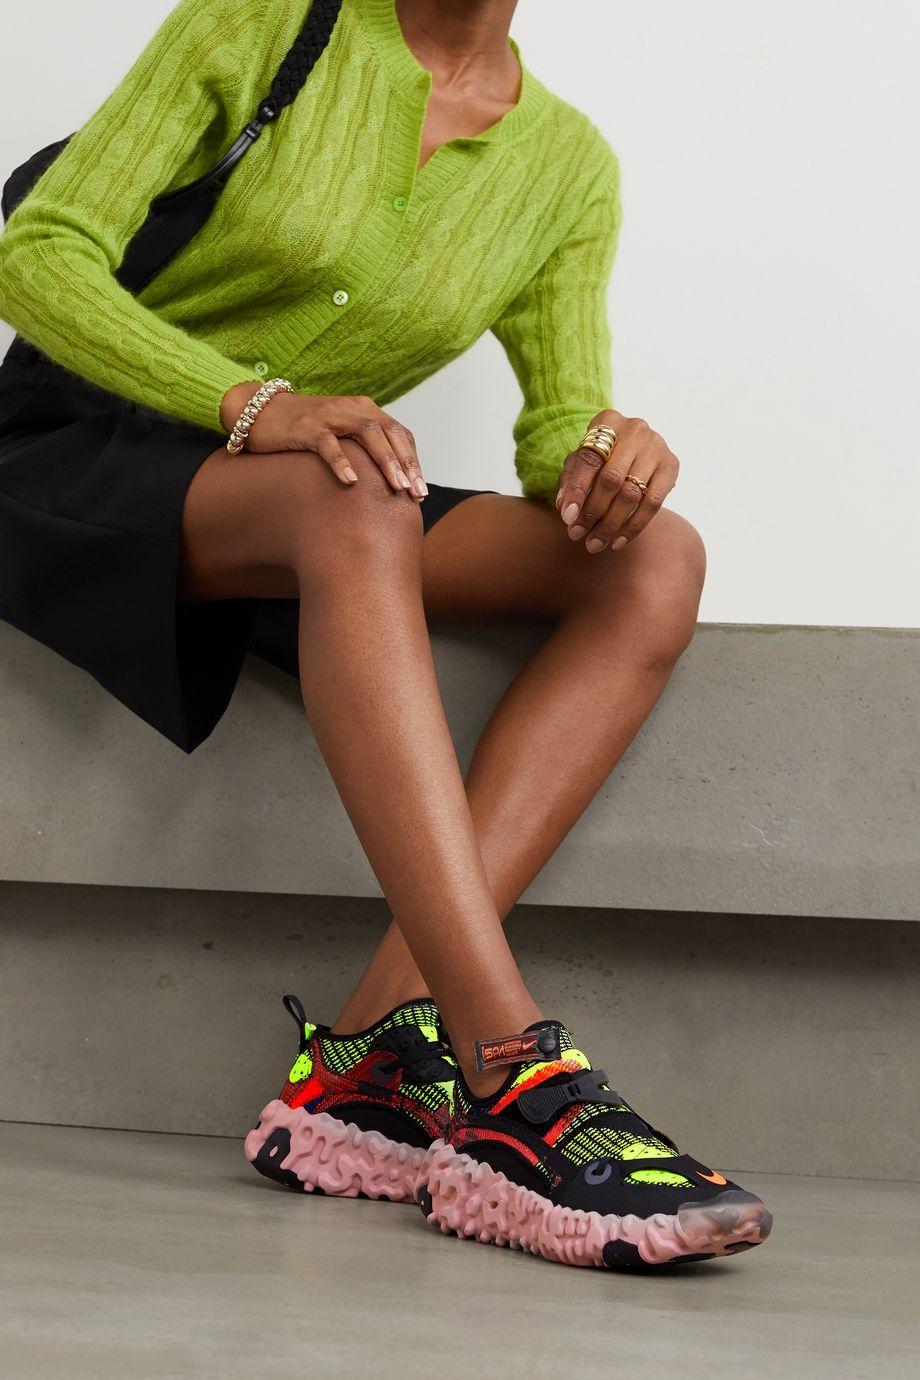 Nike ISPA OverReact Flyknit Sneakers